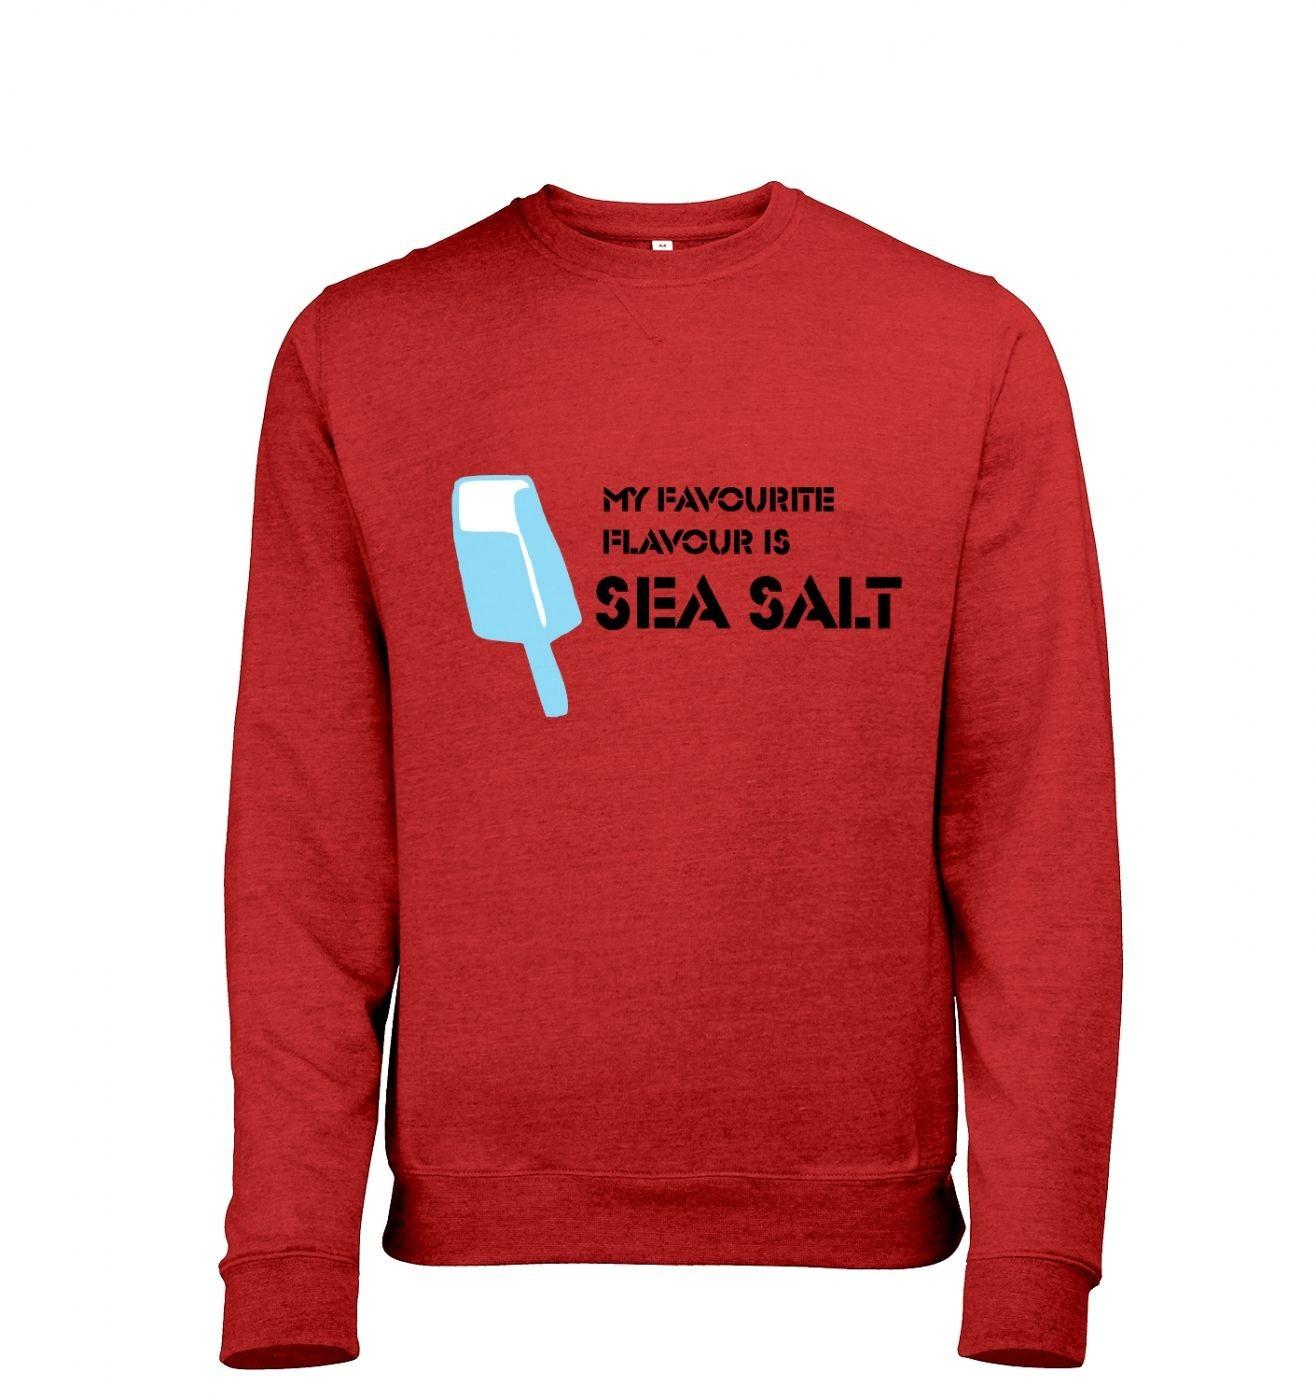 Sea Salt Ice Cream men's heather sweatshirt